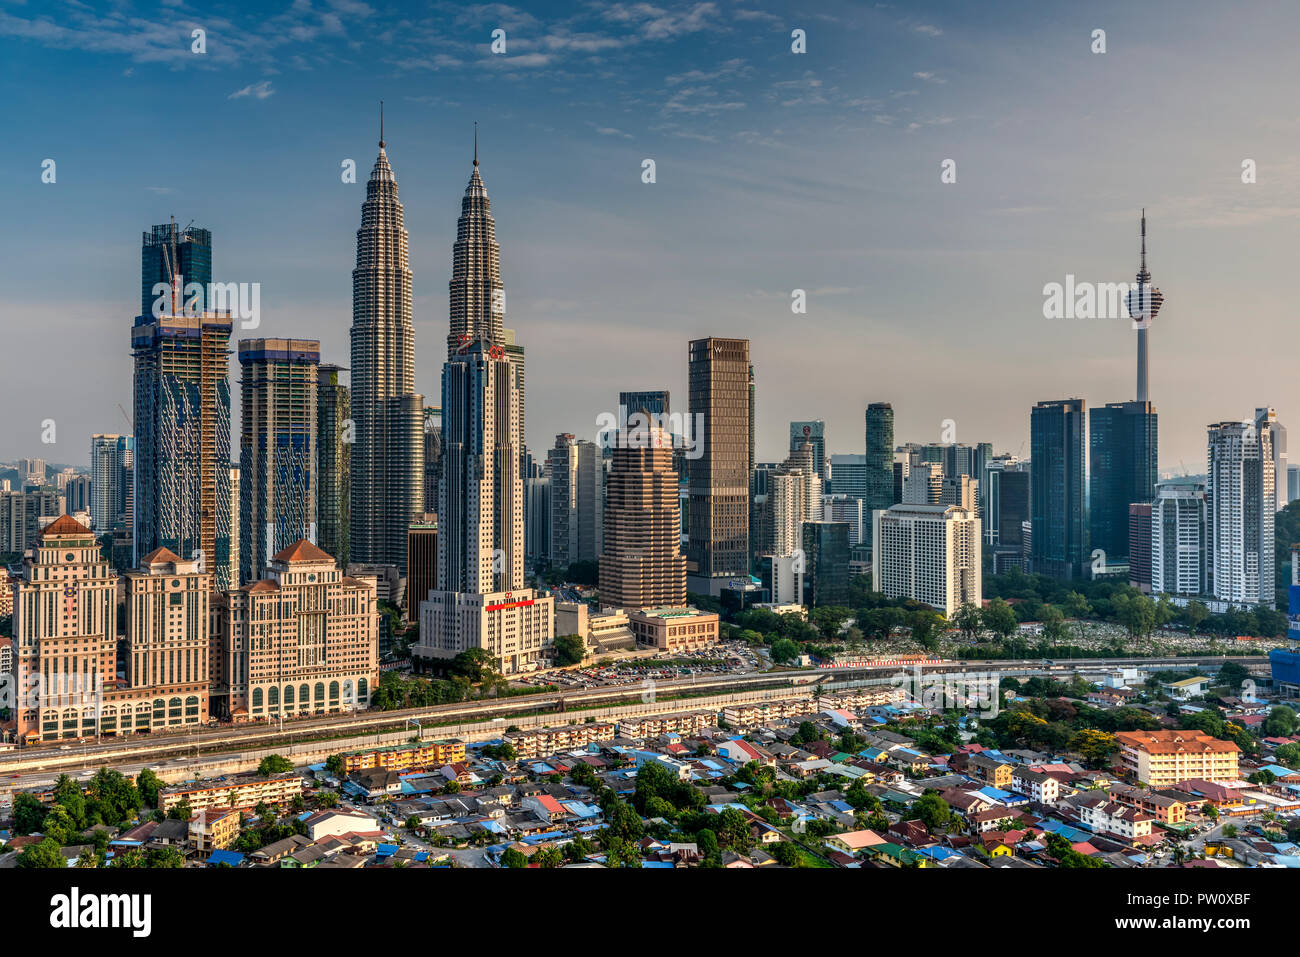 City skyline, Kuala Lumpur, Malaysia - Stock Image